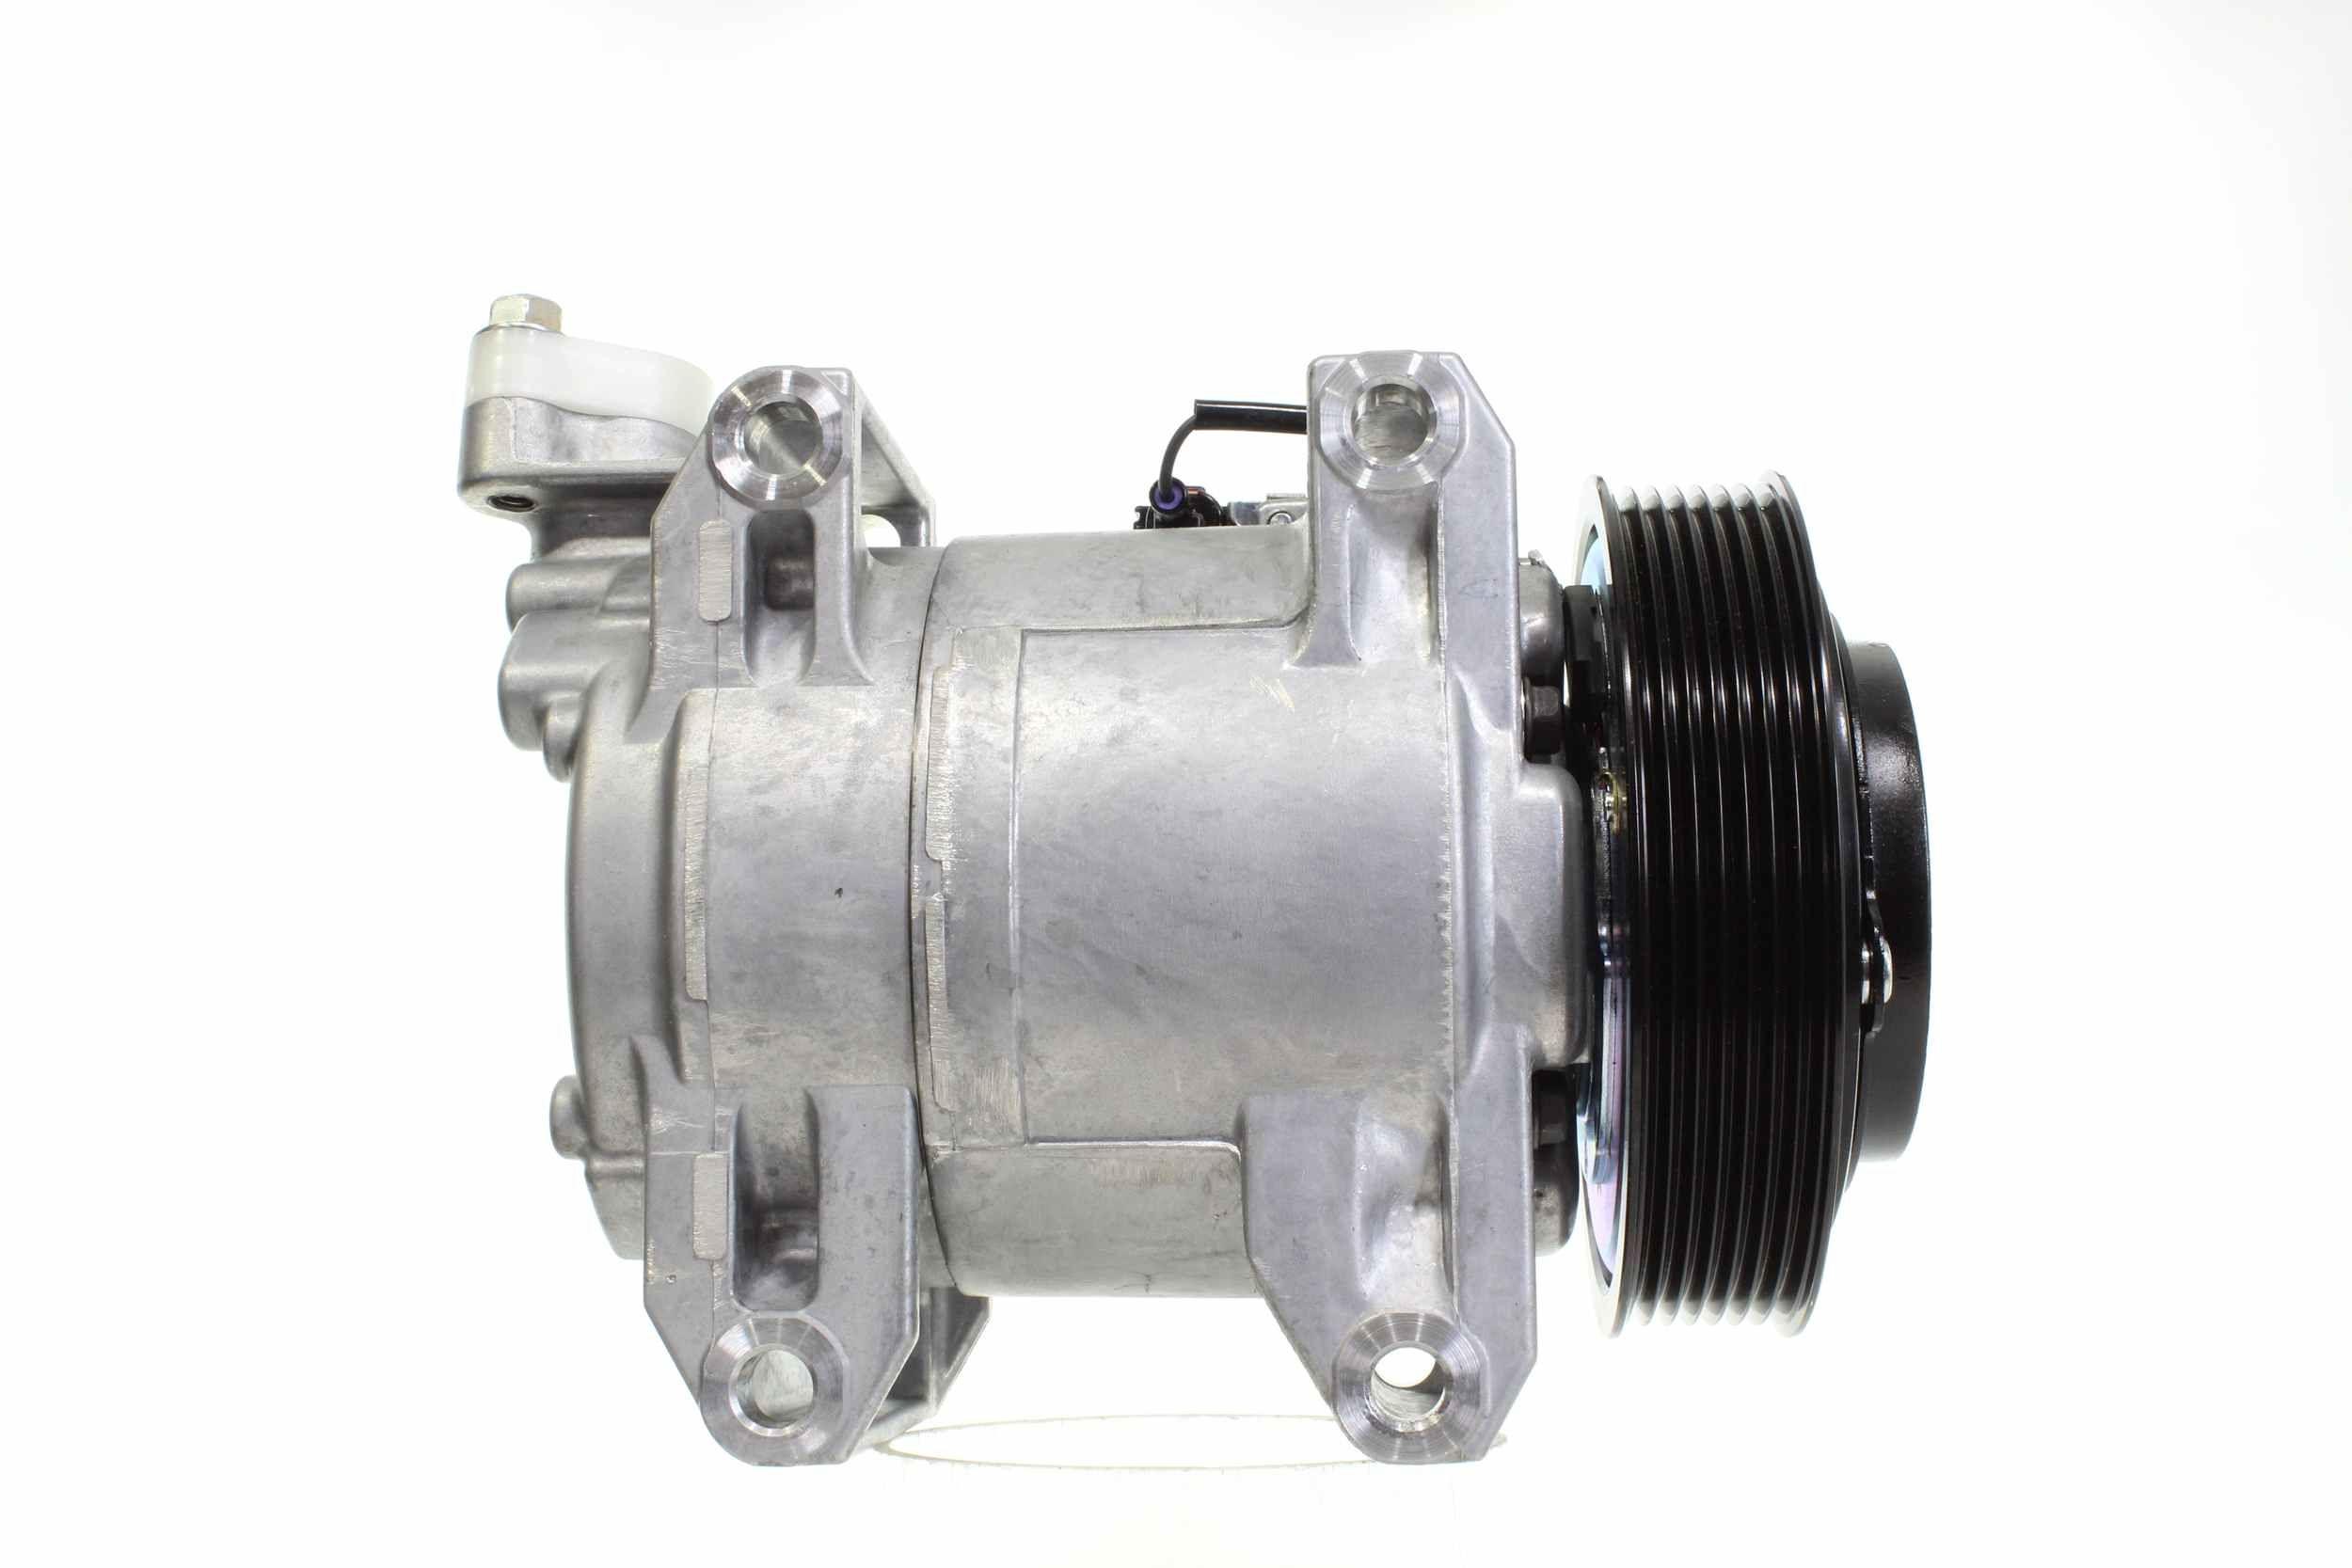 10550920 Klimaanlage Kompressor ALANKO - Markenprodukte billig